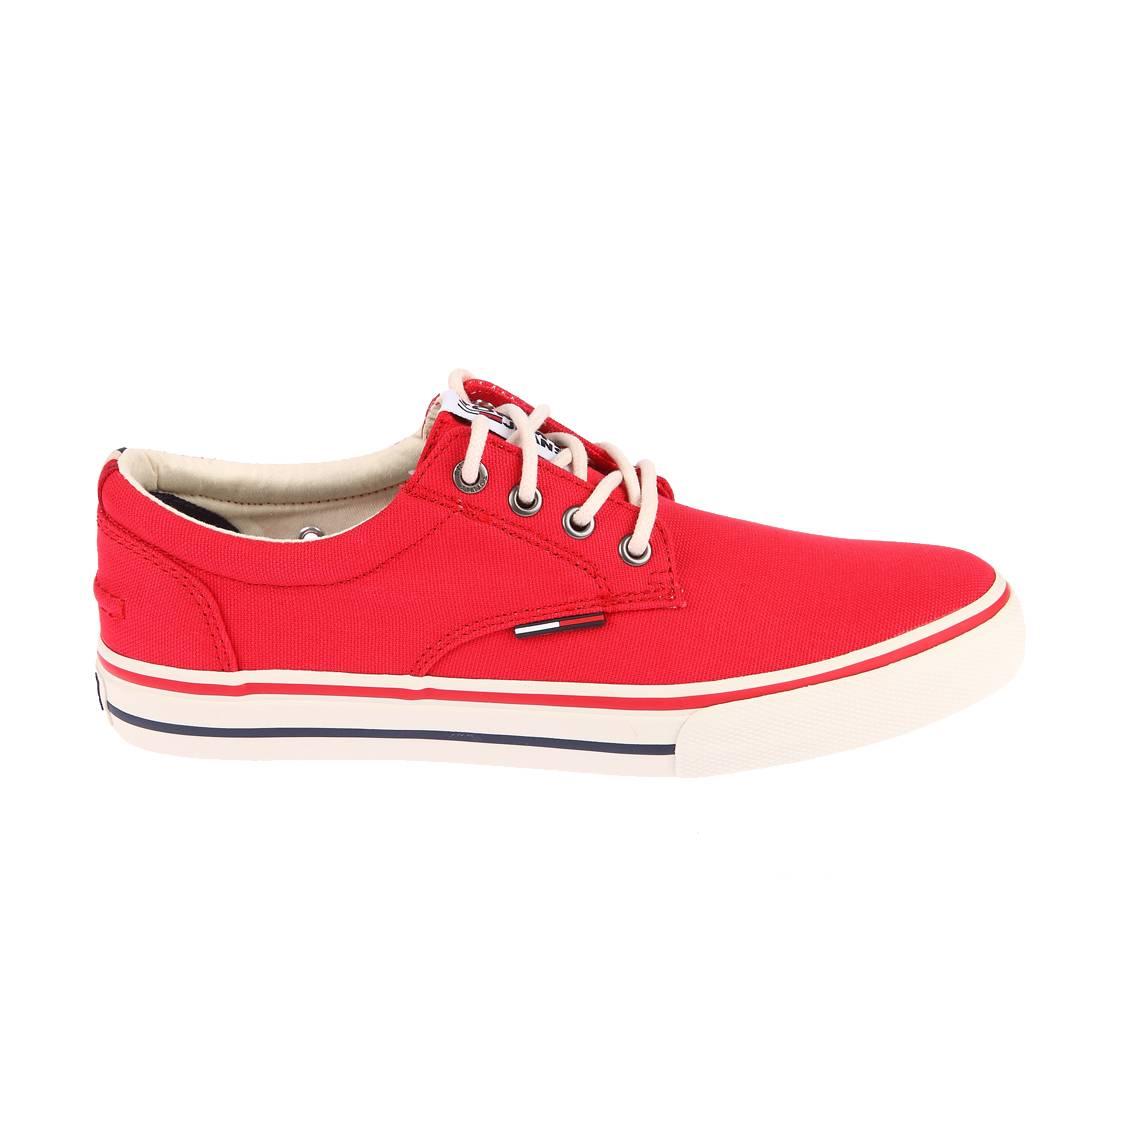 Baskets Tommy Jeans en toile rouge floquées